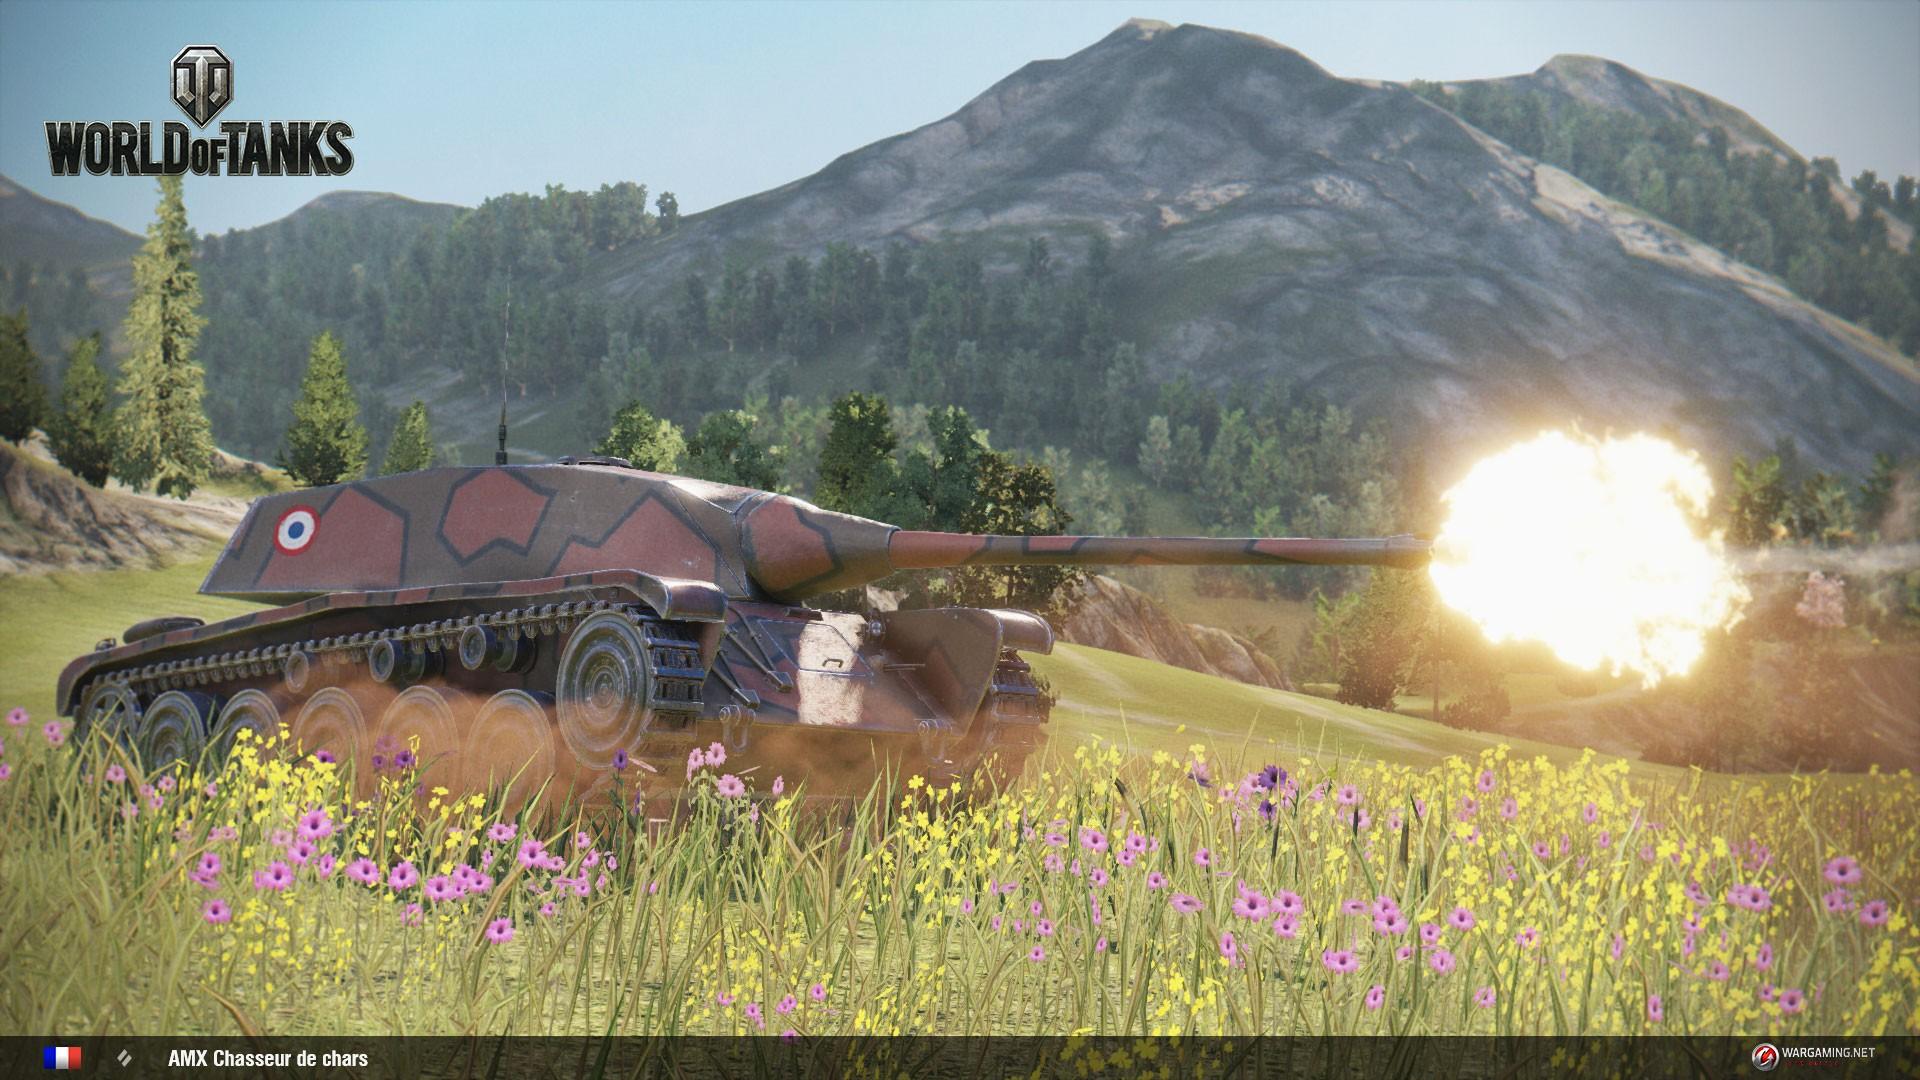 Французская техника AMX chasseur de char